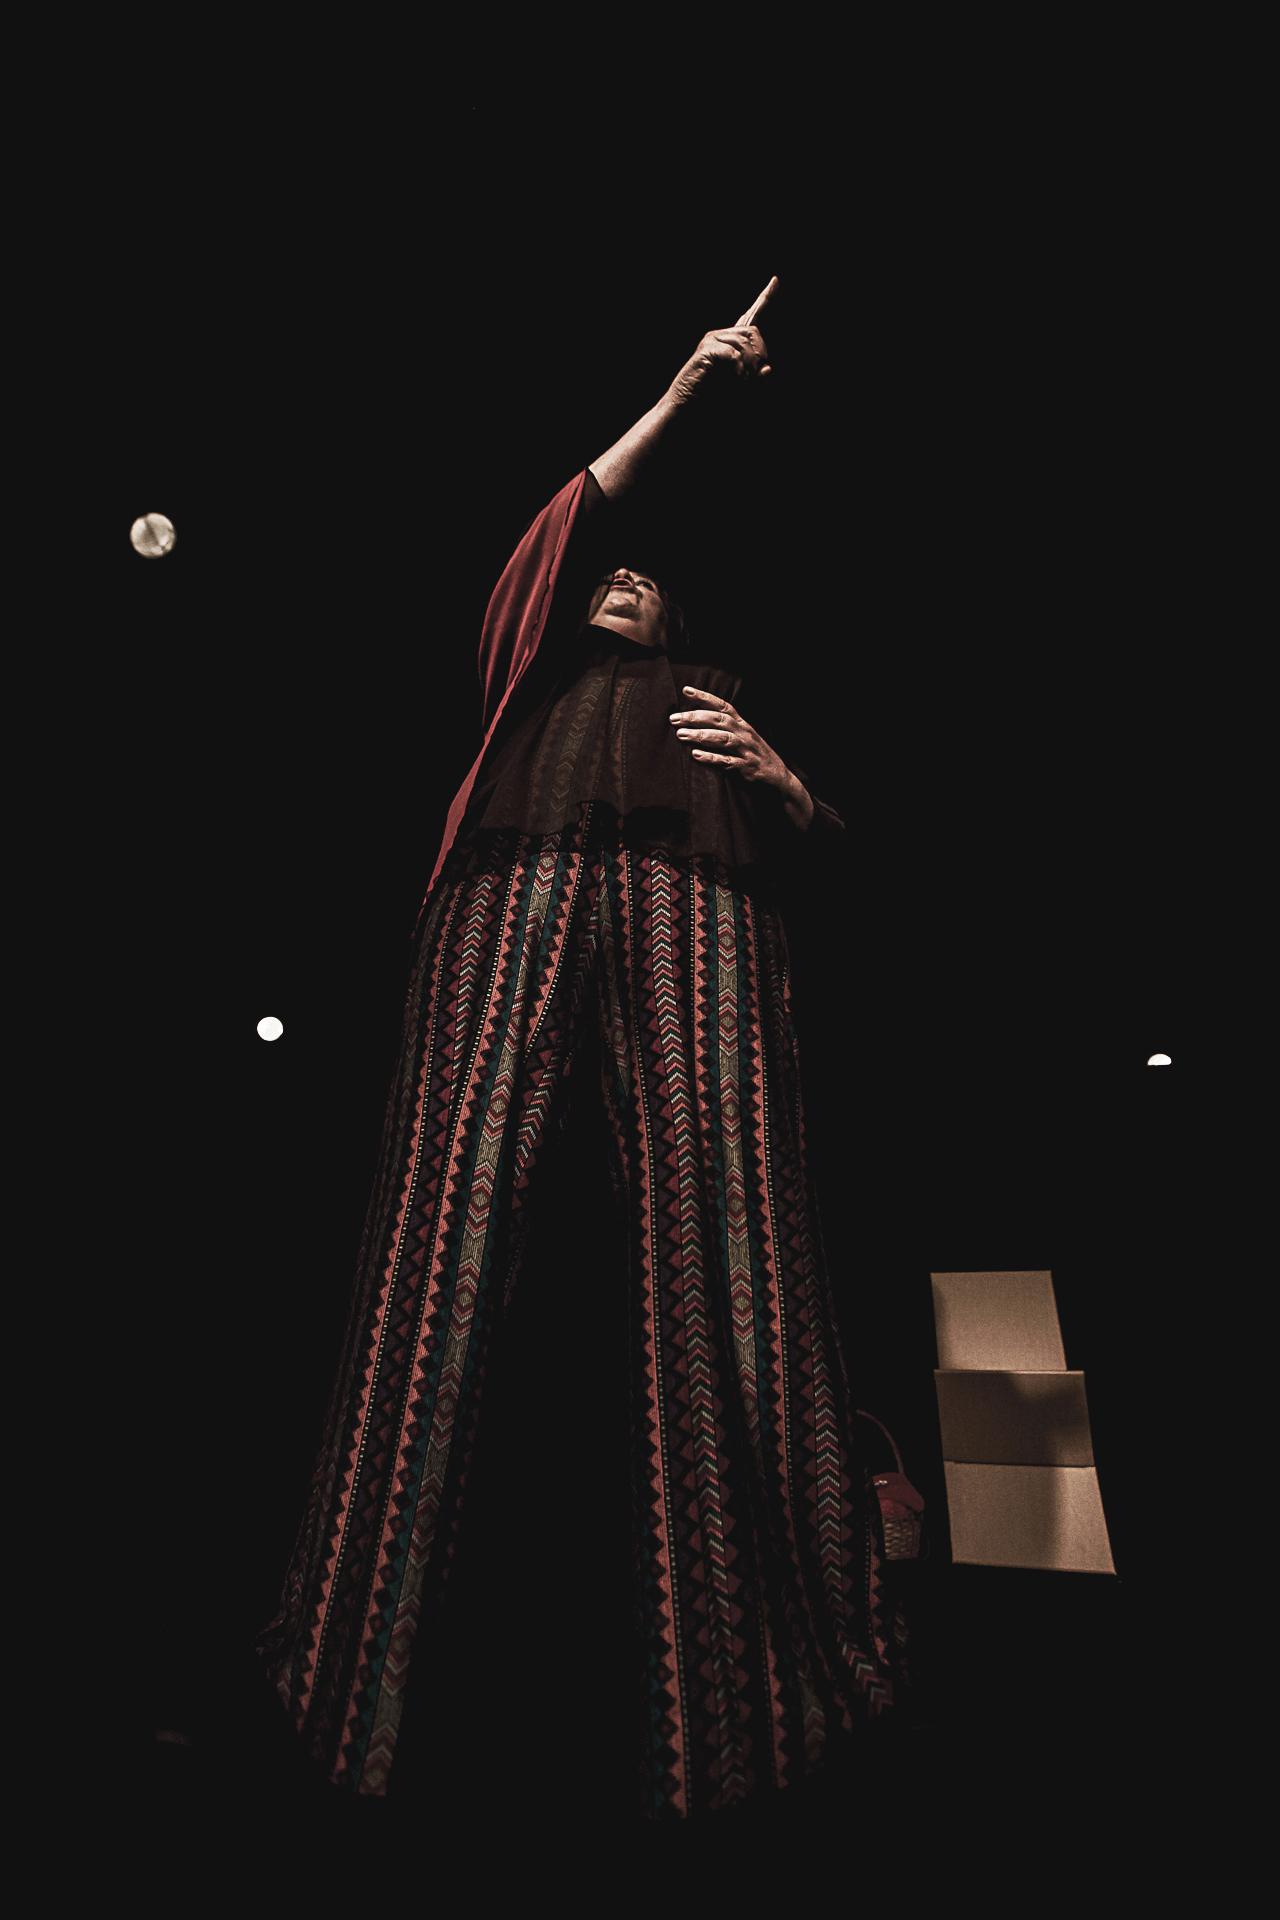 Doroteia Serafim outras historias assim Photography Fotografia On Stage Theatre Teatro bonjourmolotov Andre Gigante 03